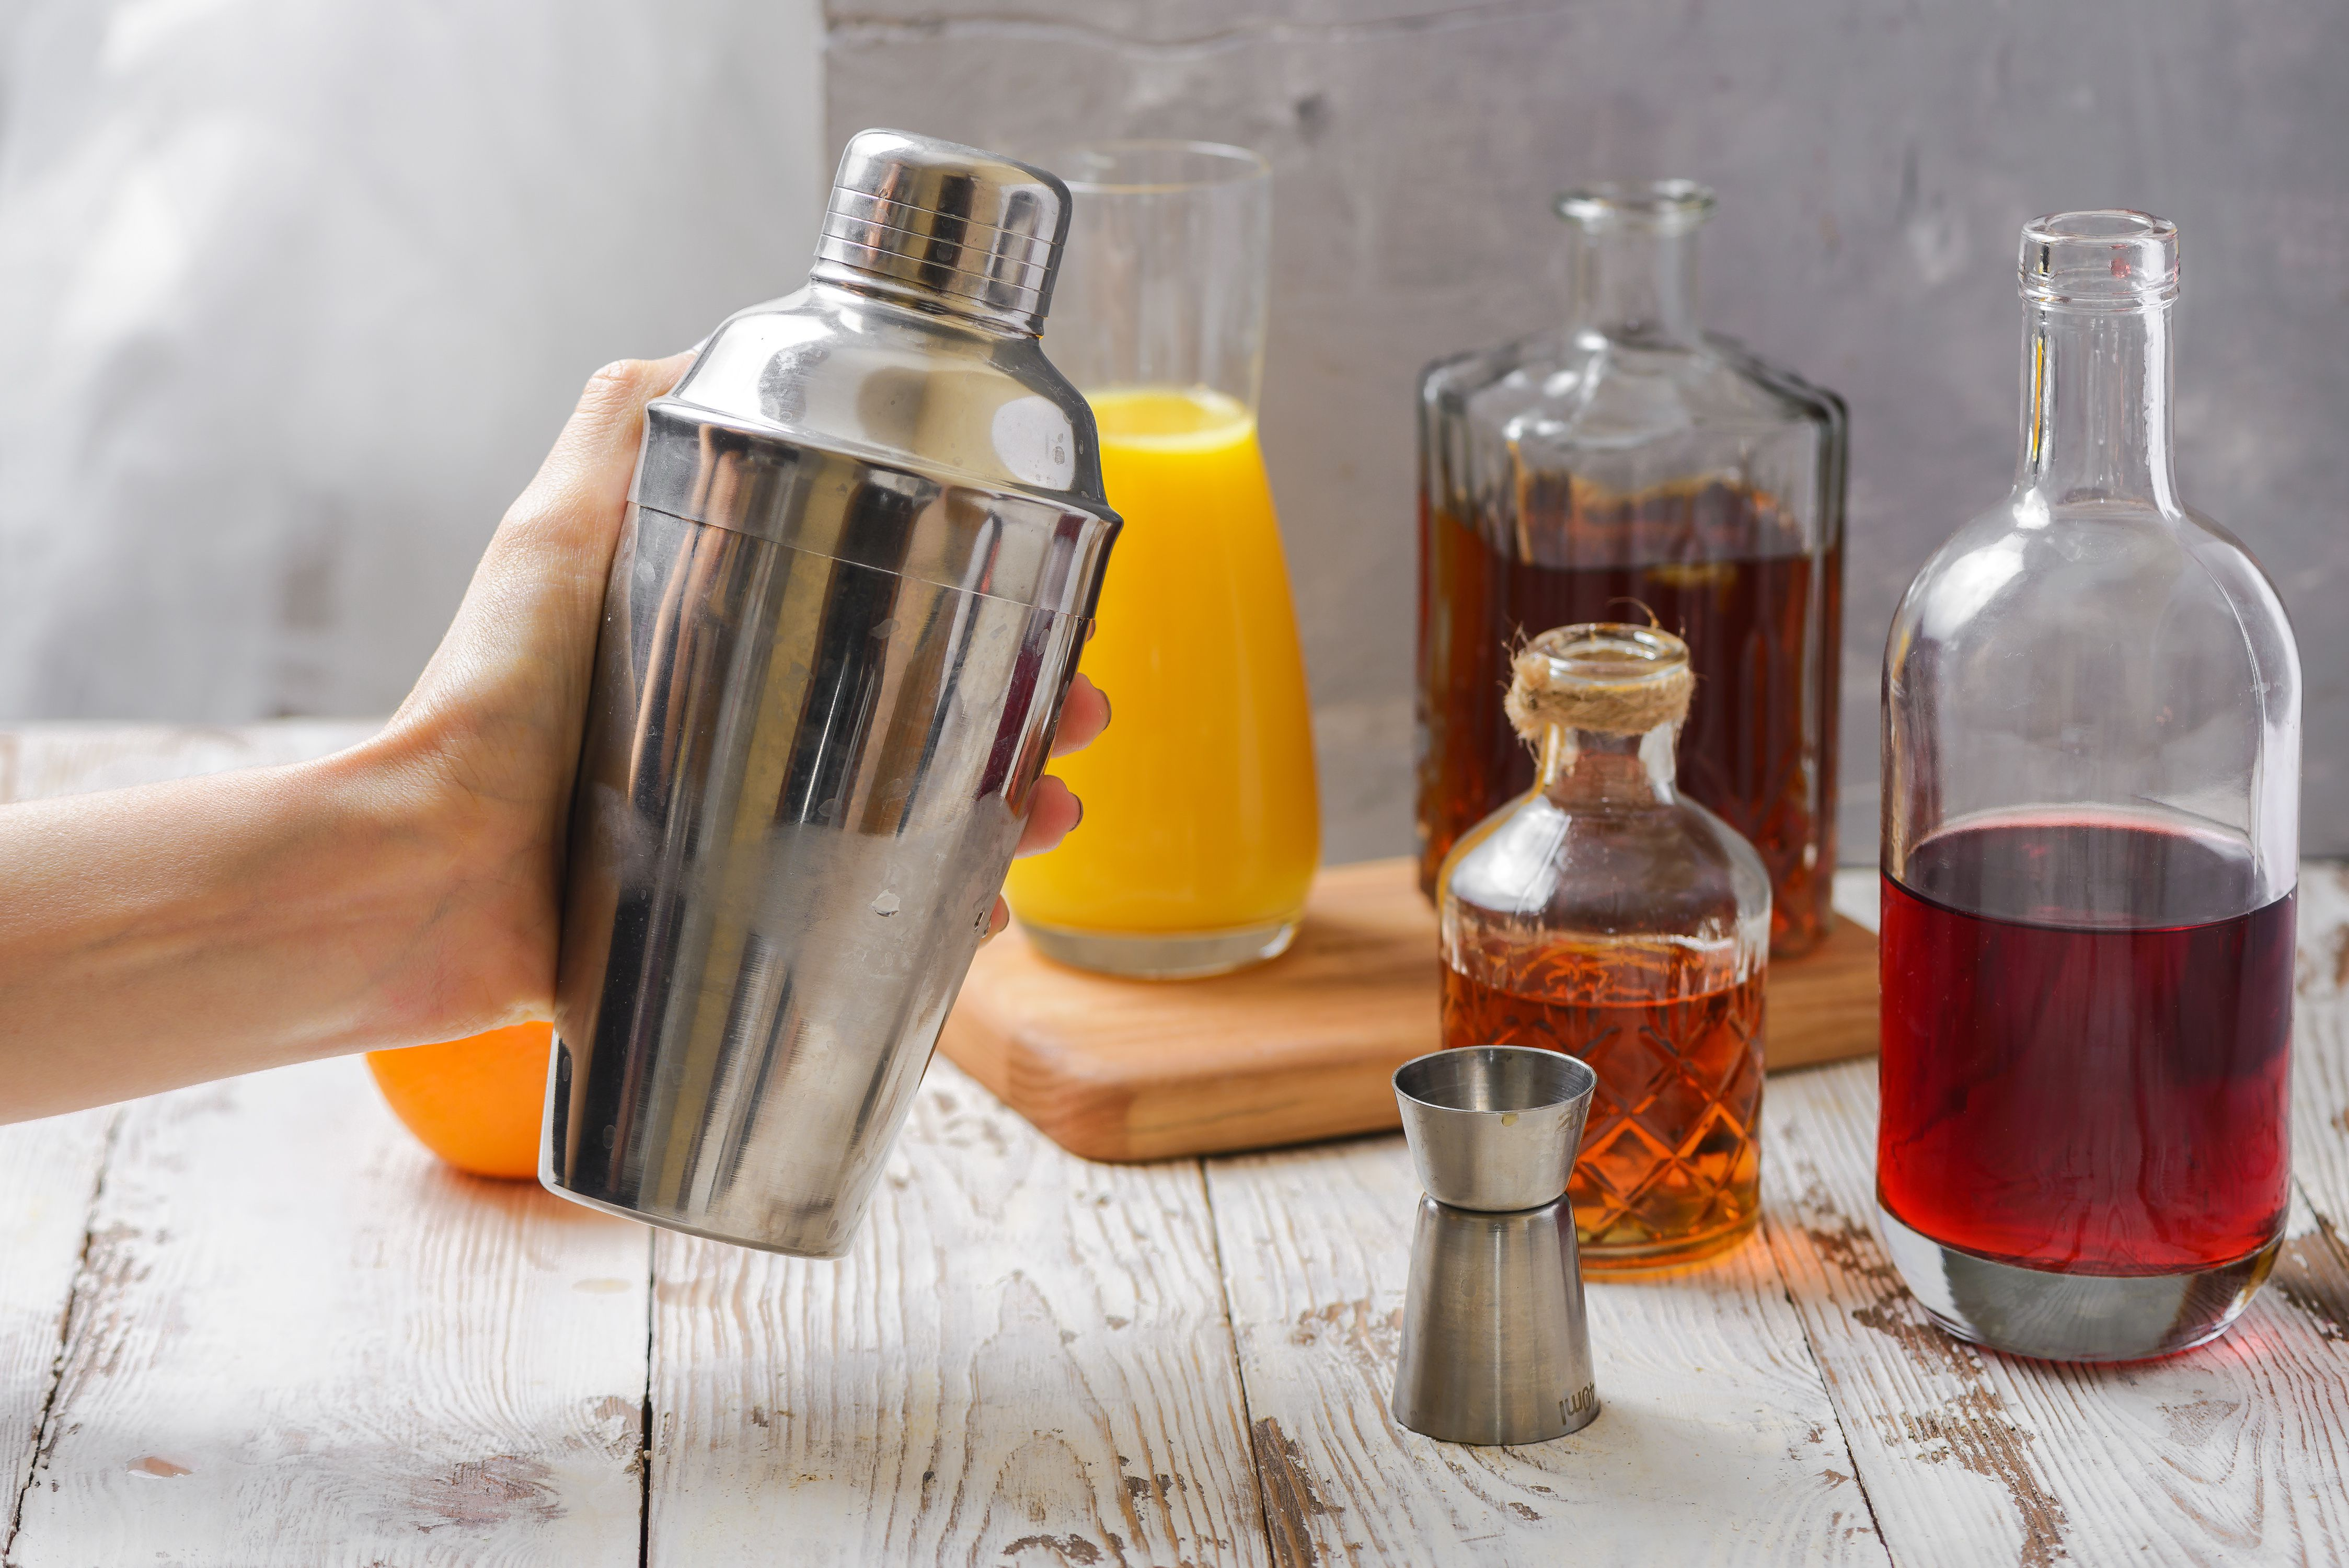 Shaker with Alabama Slammer ingredients